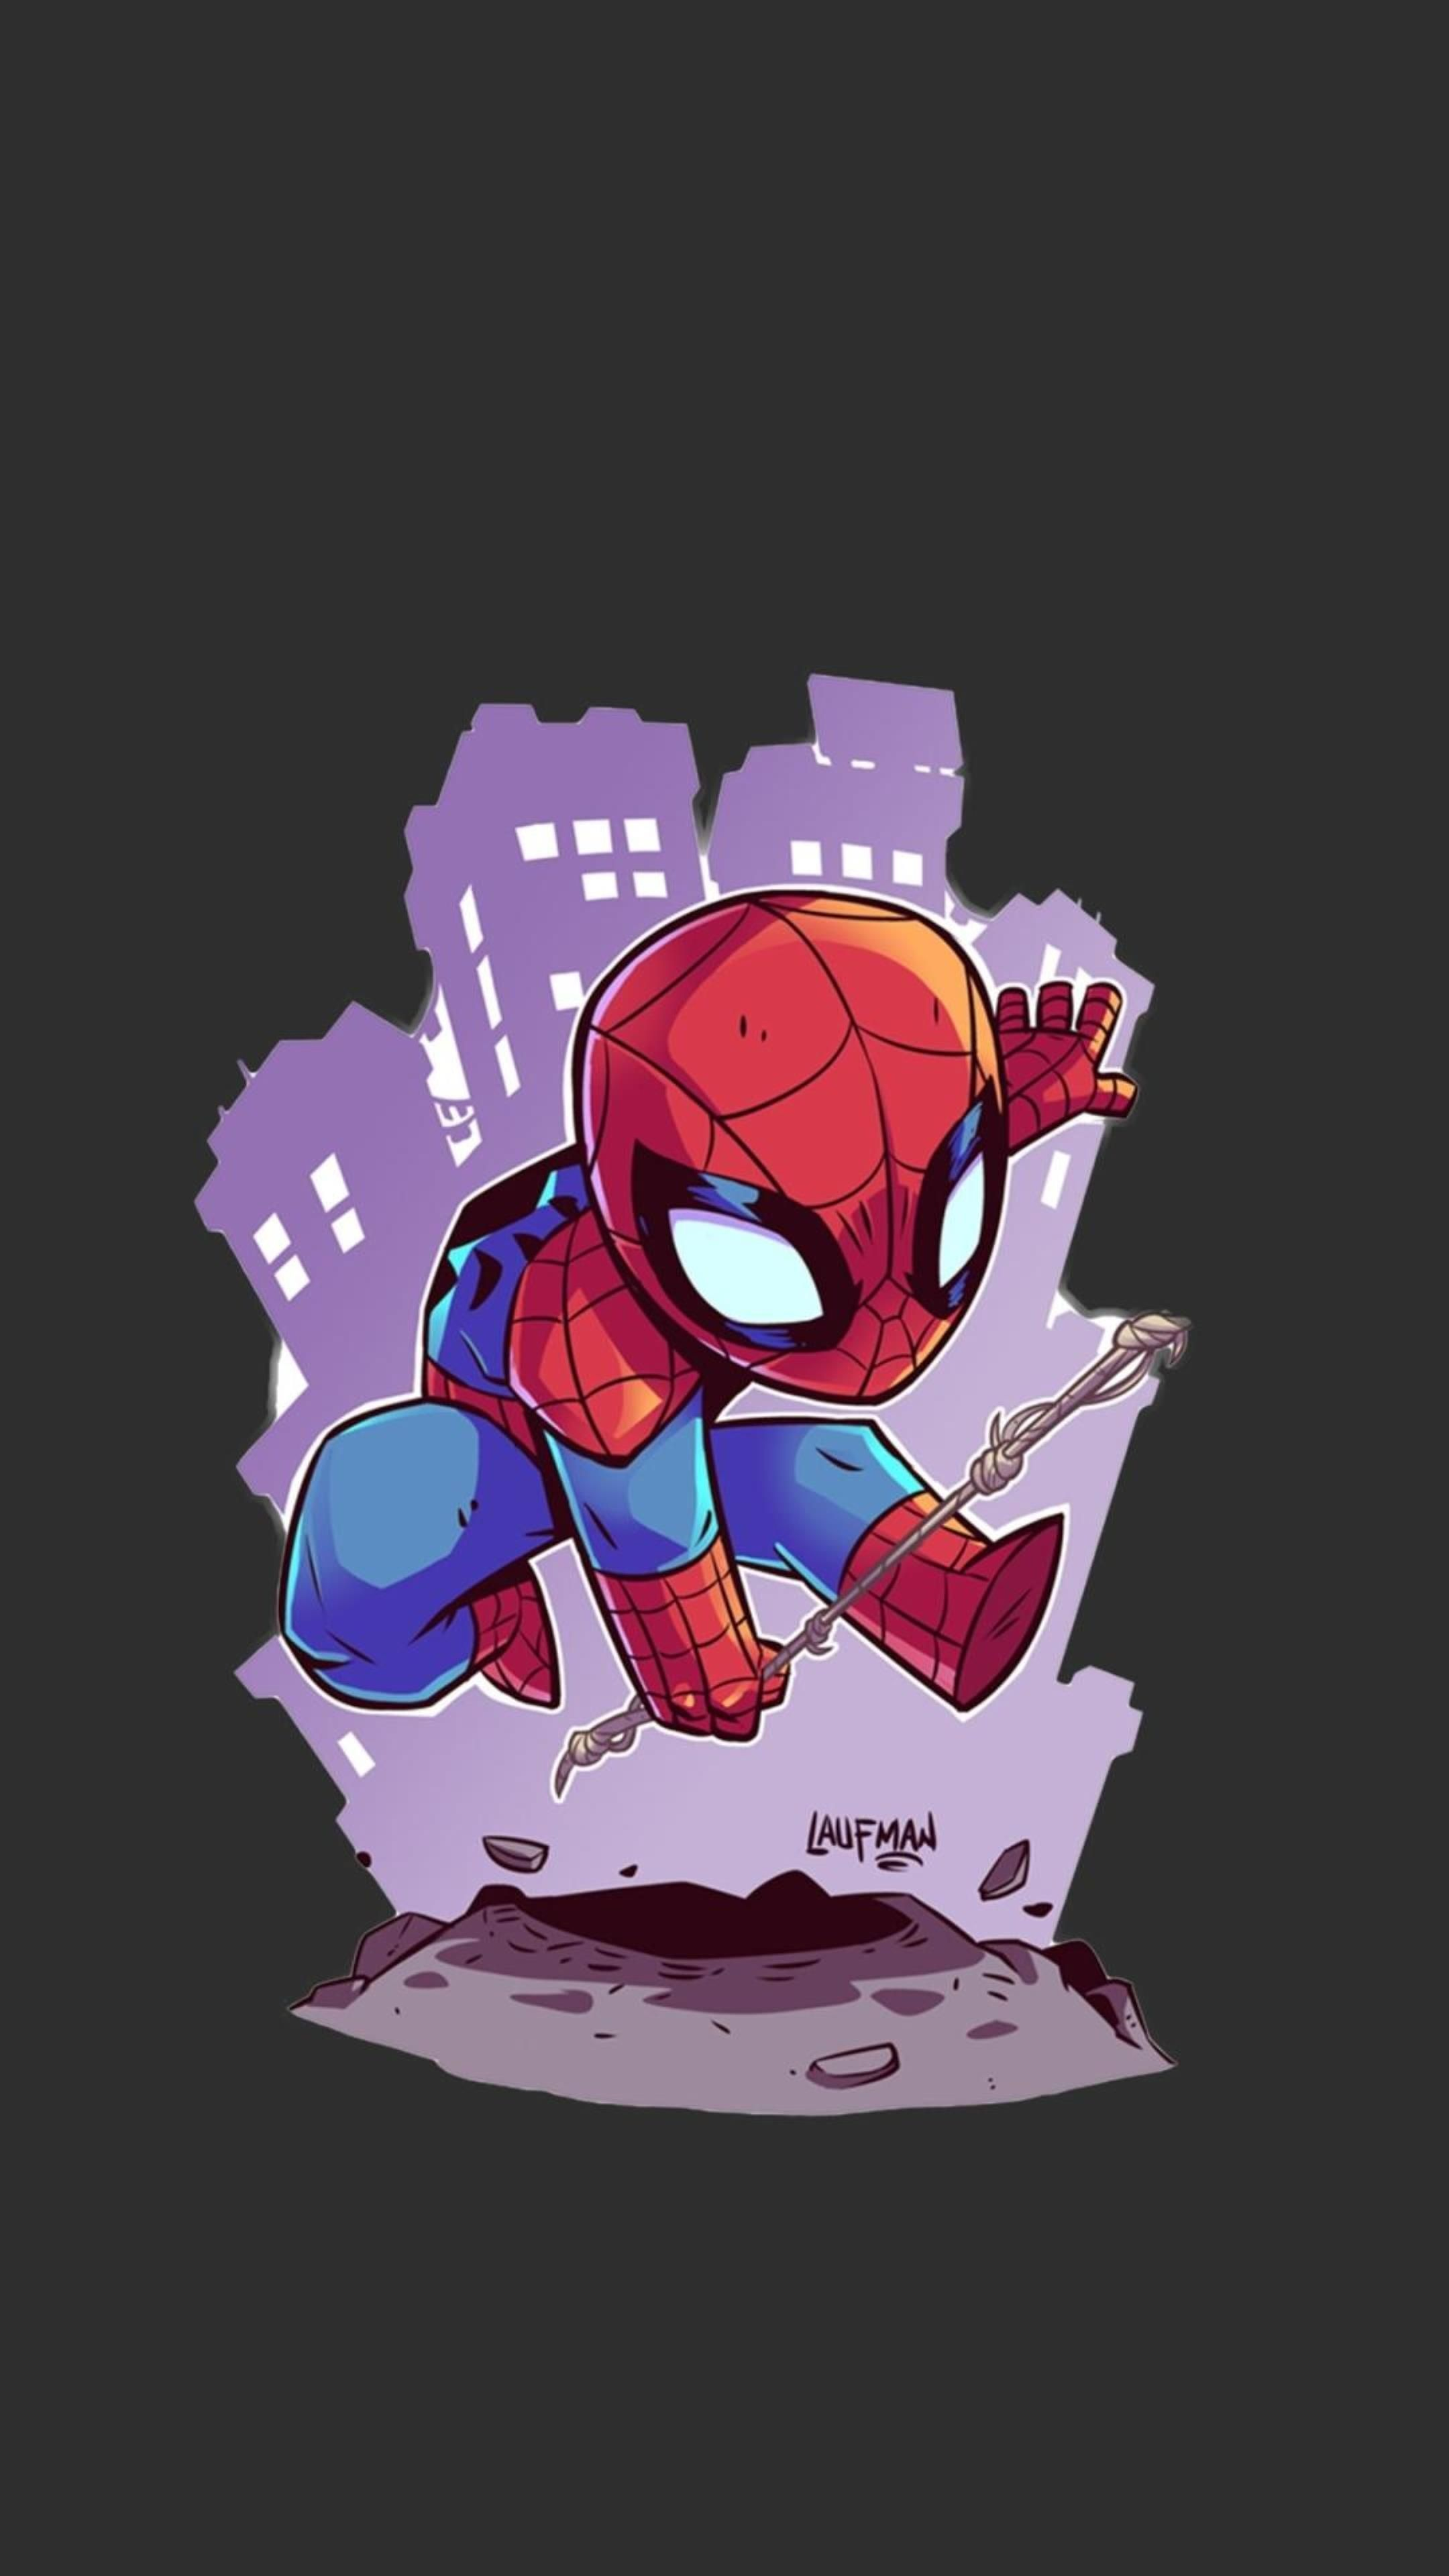 Spiderman Wallpapers Spiderman Marvel Wallpaper Avengers